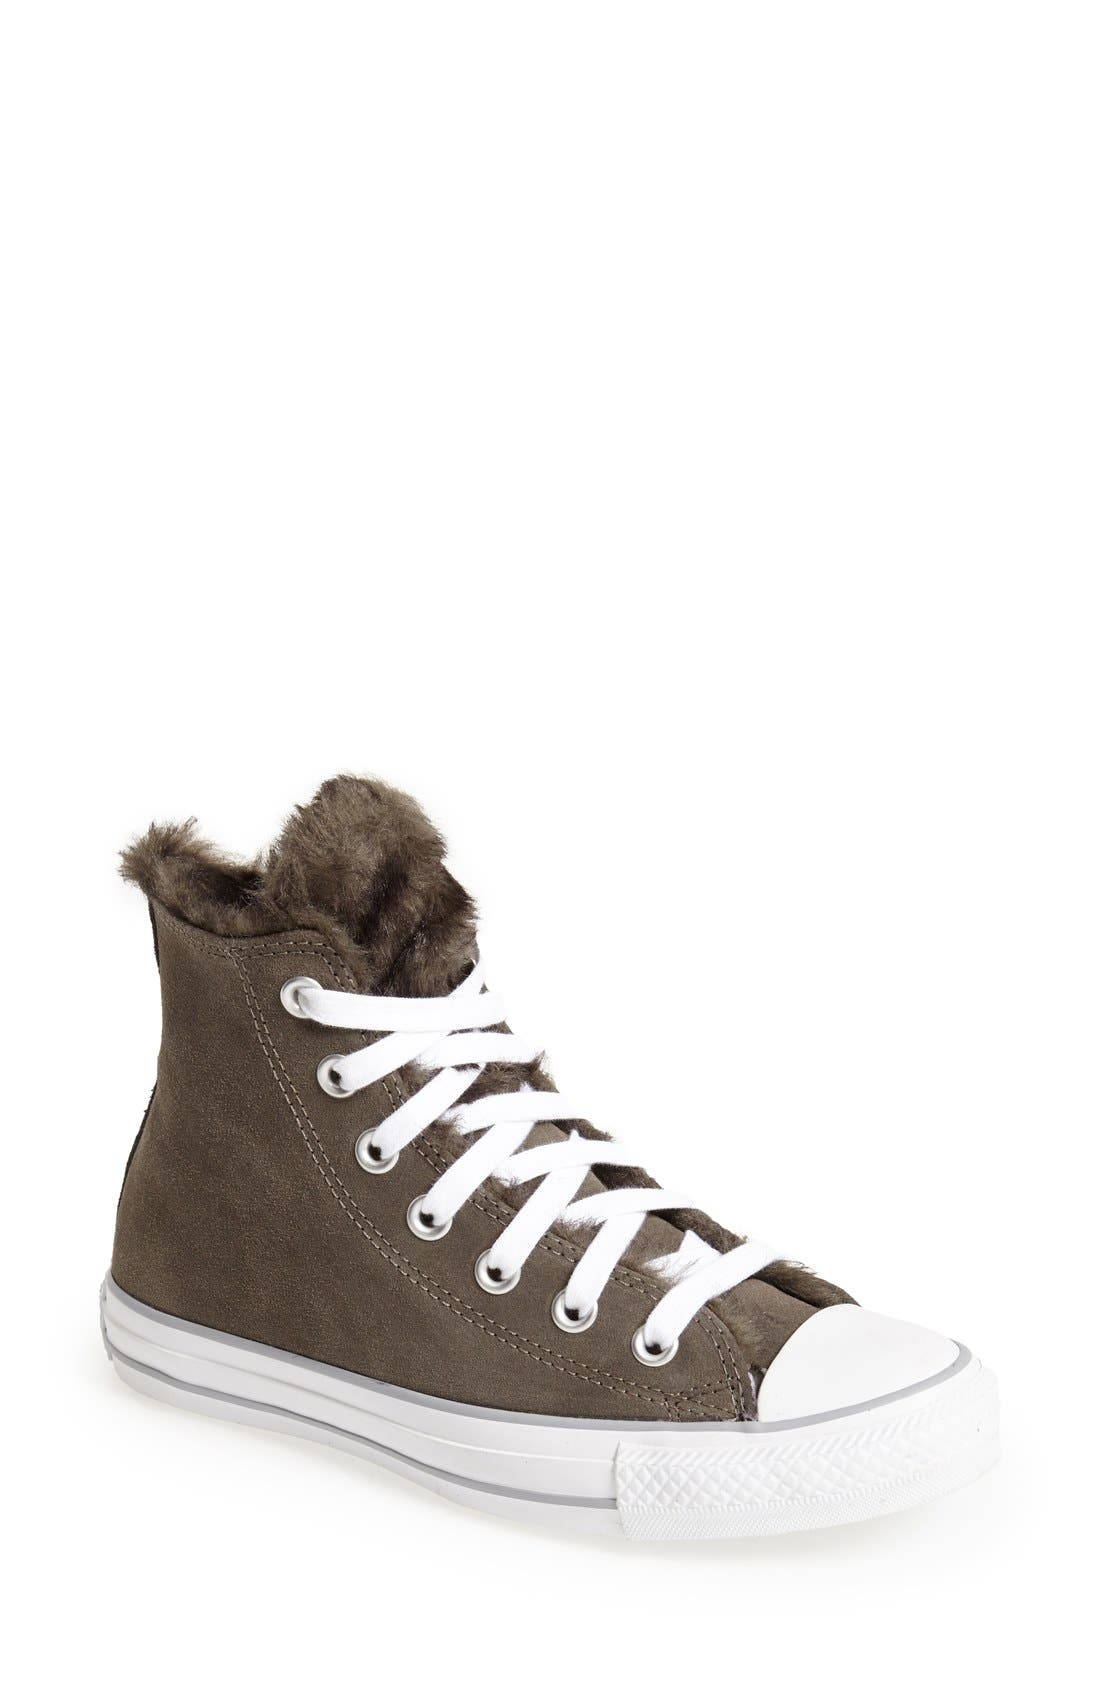 Alternate Image 1 Selected - Converse Chuck Taylor® All Star® 'Fun Fur' High-Top Sneaker (Women)